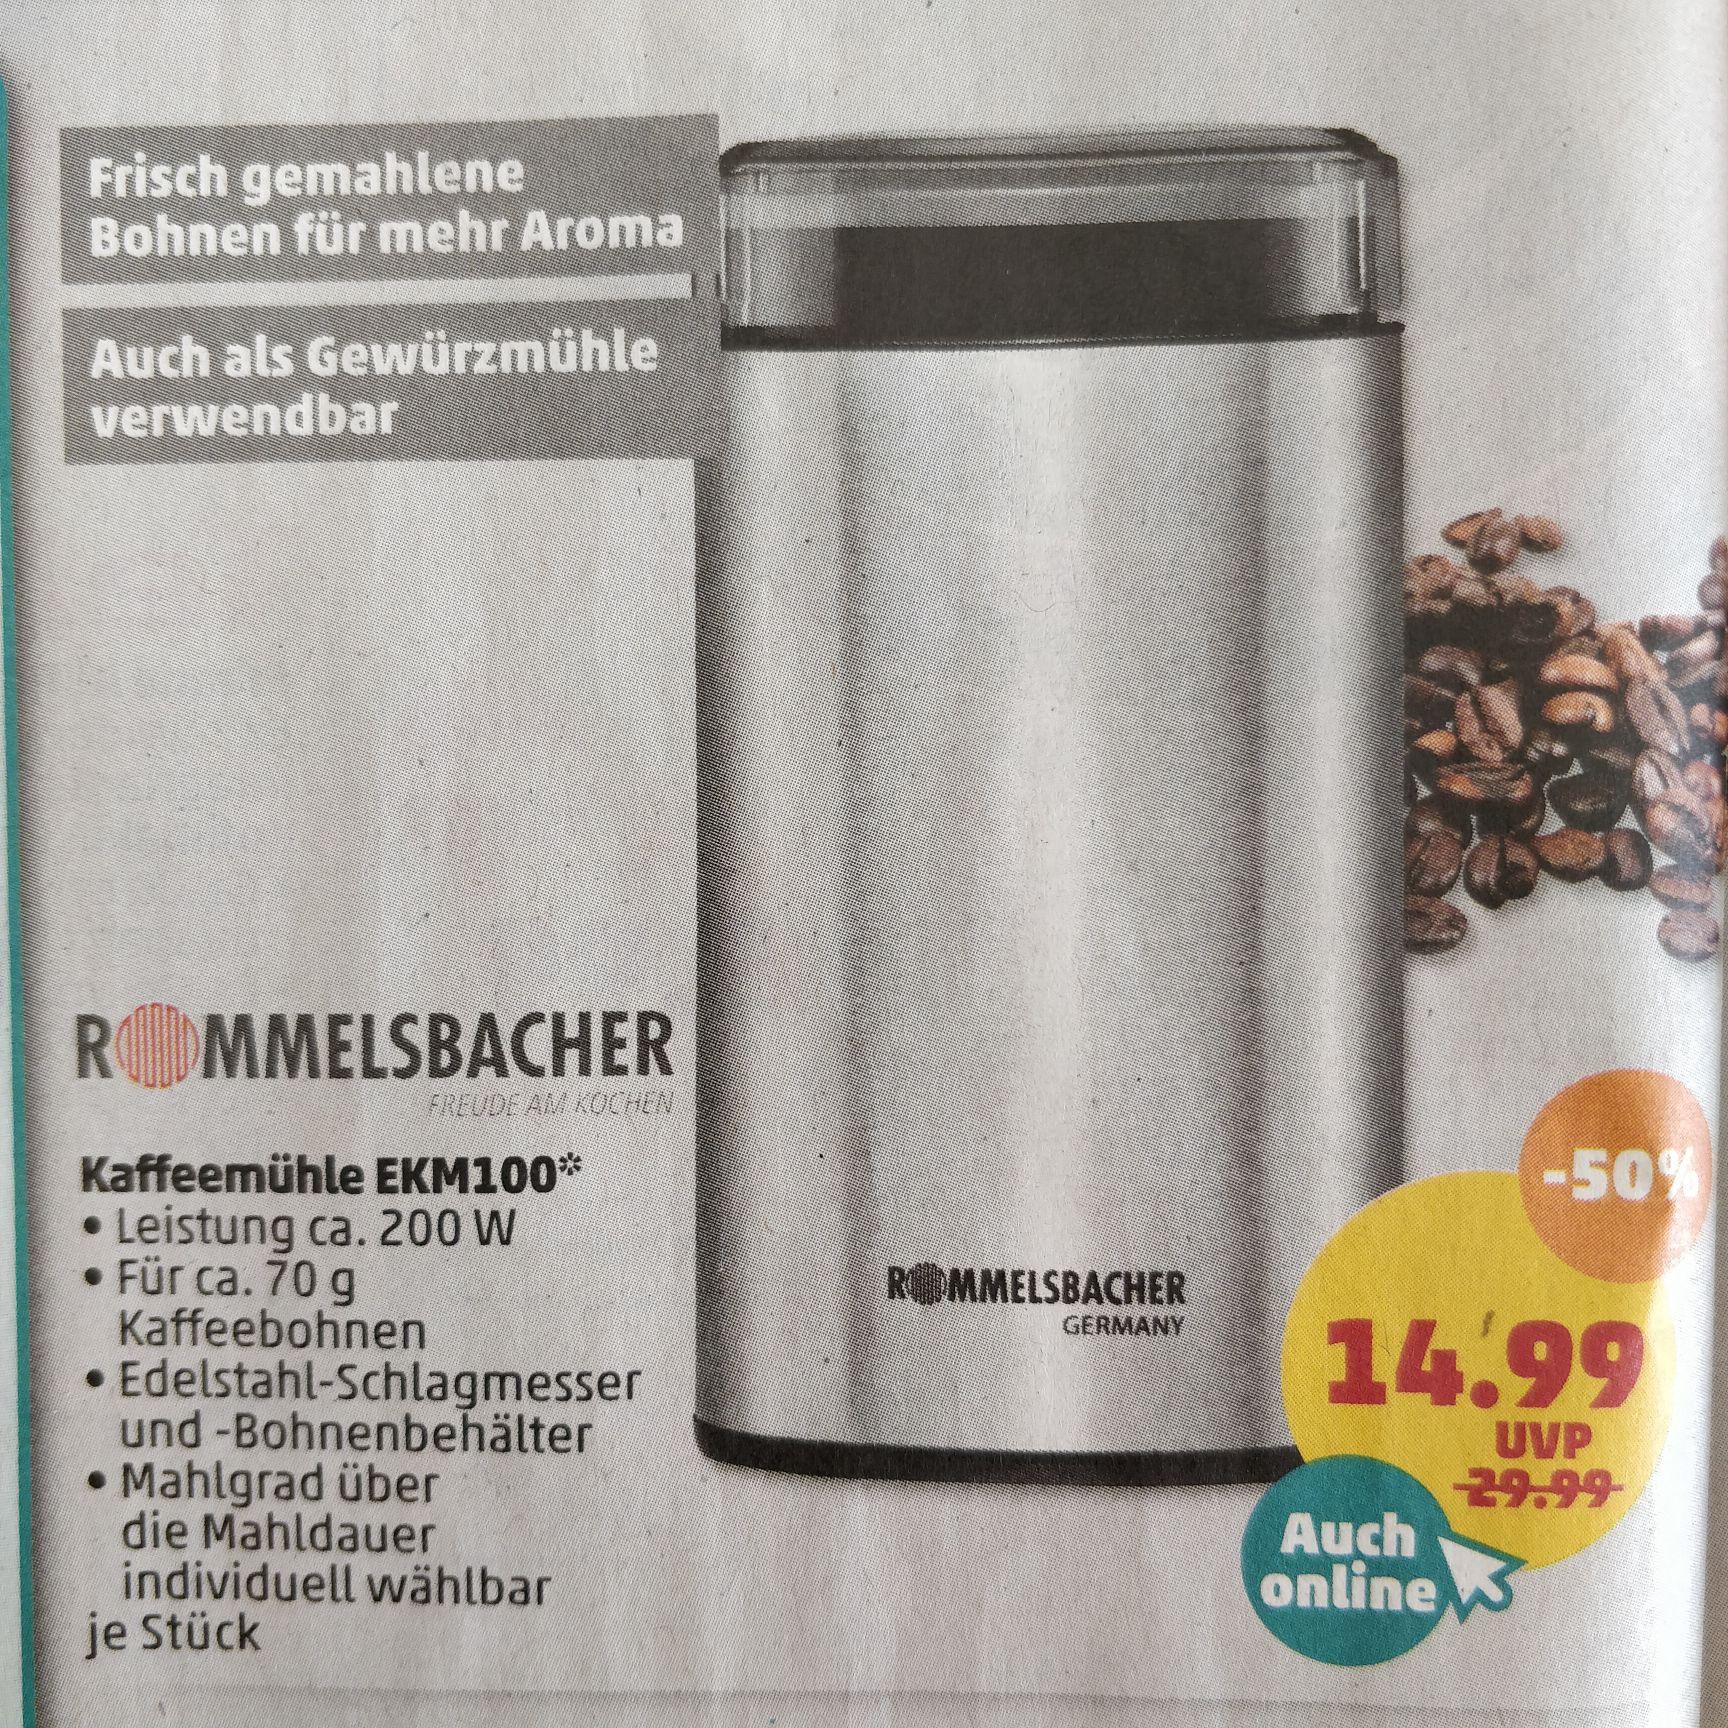 Rommelsbacher Kaffeemühle EKM100 Schlagmessermühle [Penny]